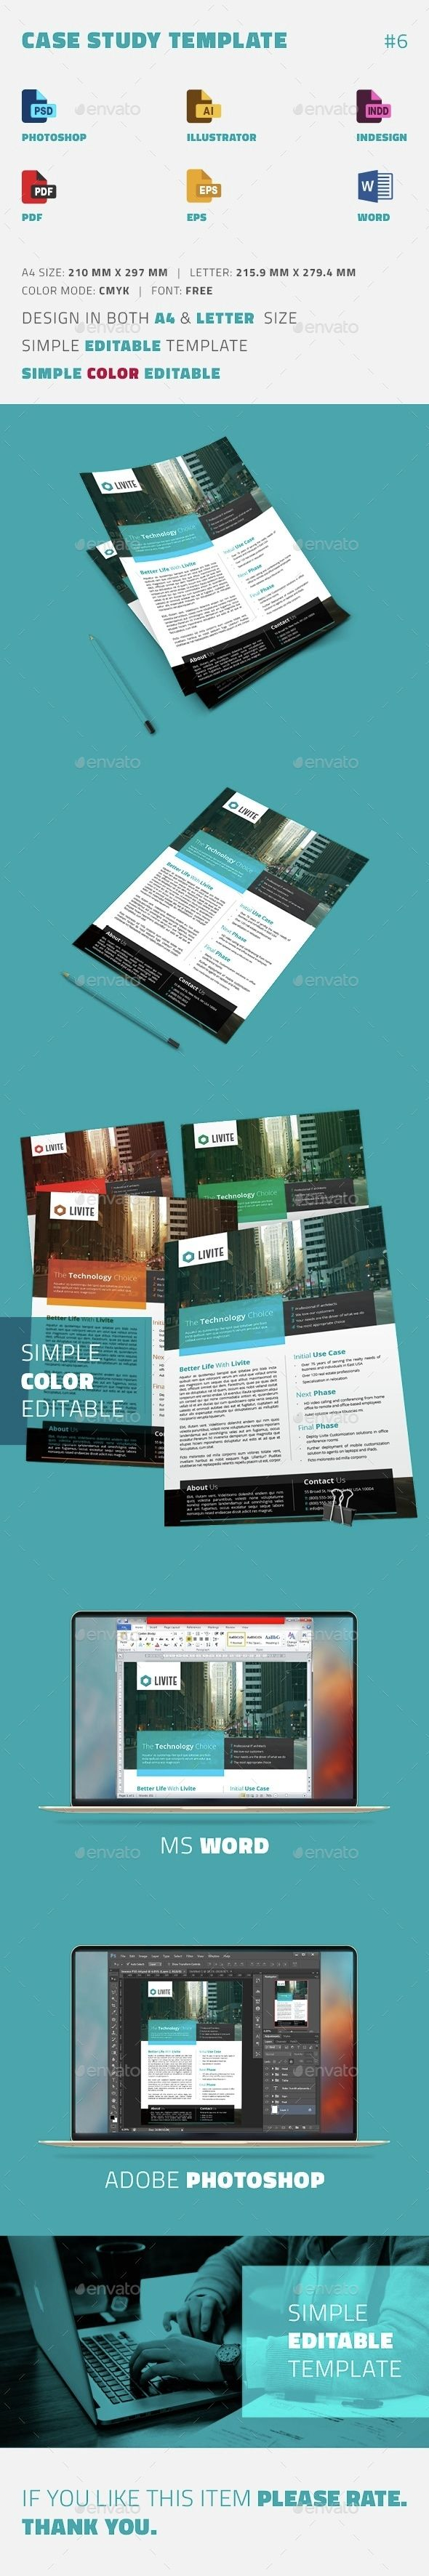 case study template powerpoint presentation rma design our work     Cruzine